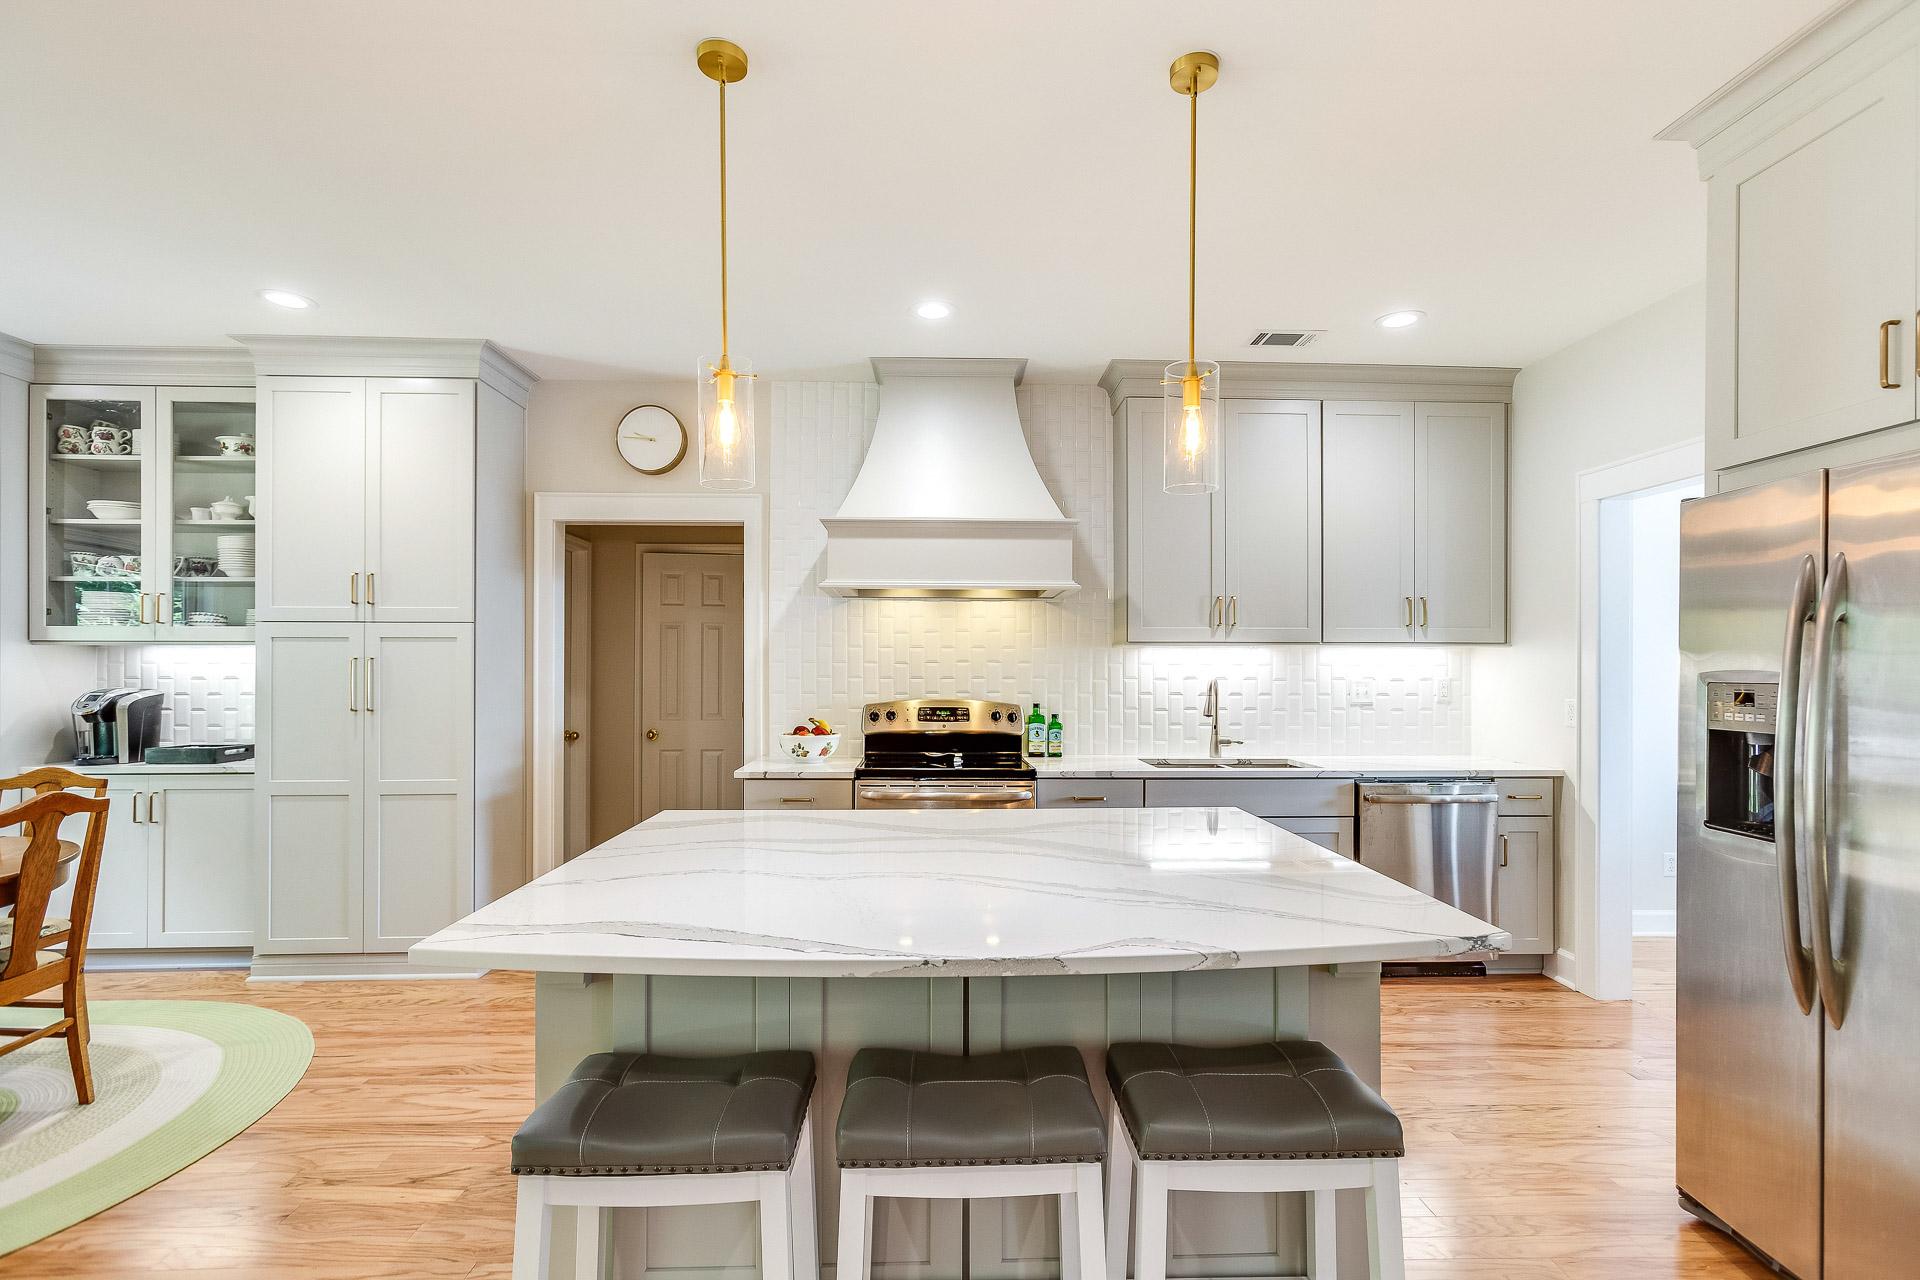 An open concept kitchen with a large Cambria Britannica quartz kitchen island countertop.